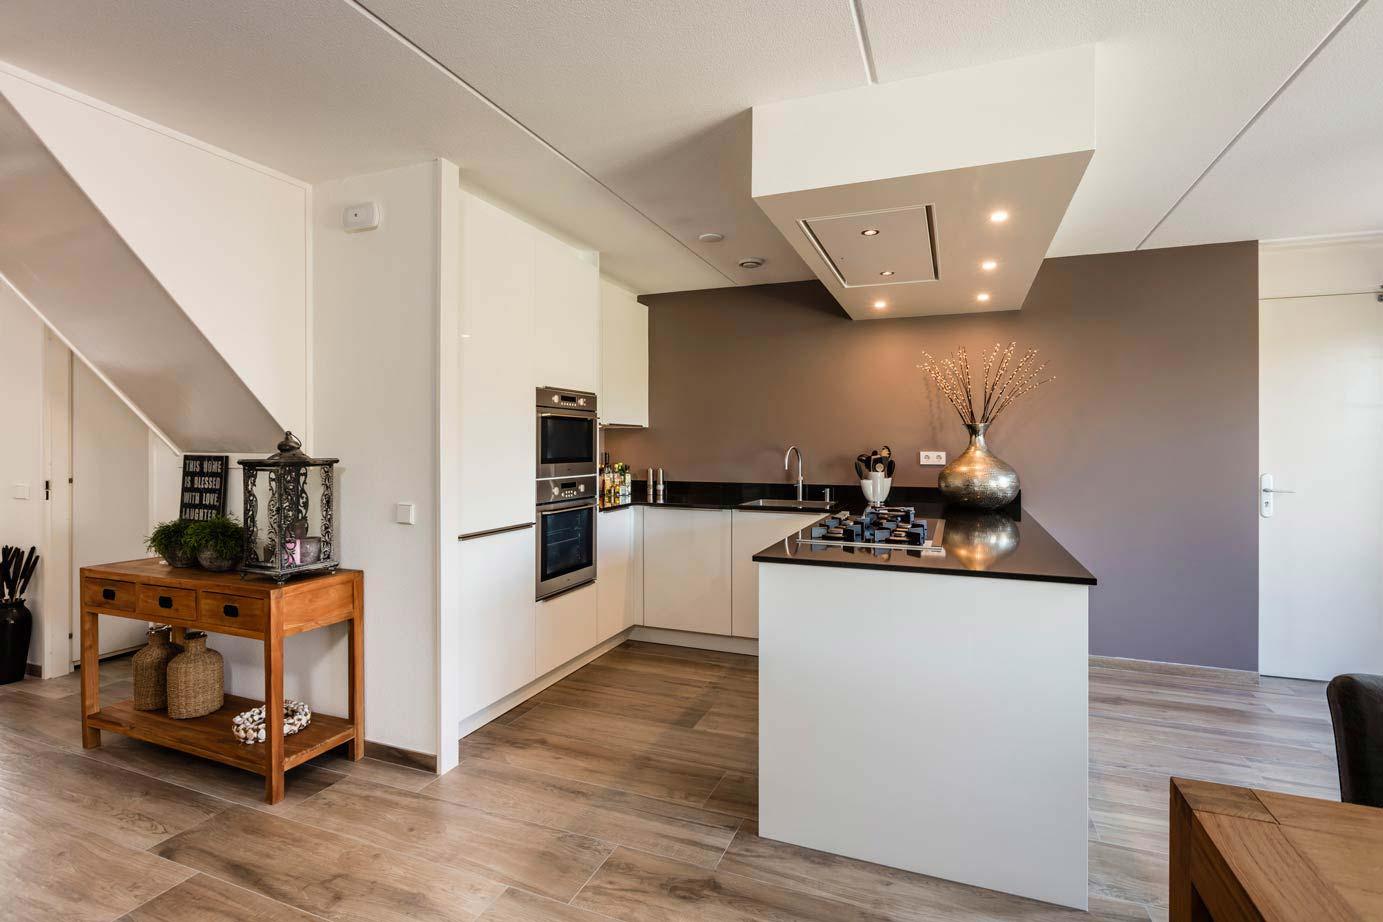 Modern Keuken Schiereiland : Moderne keukens volledige ontzorging keur